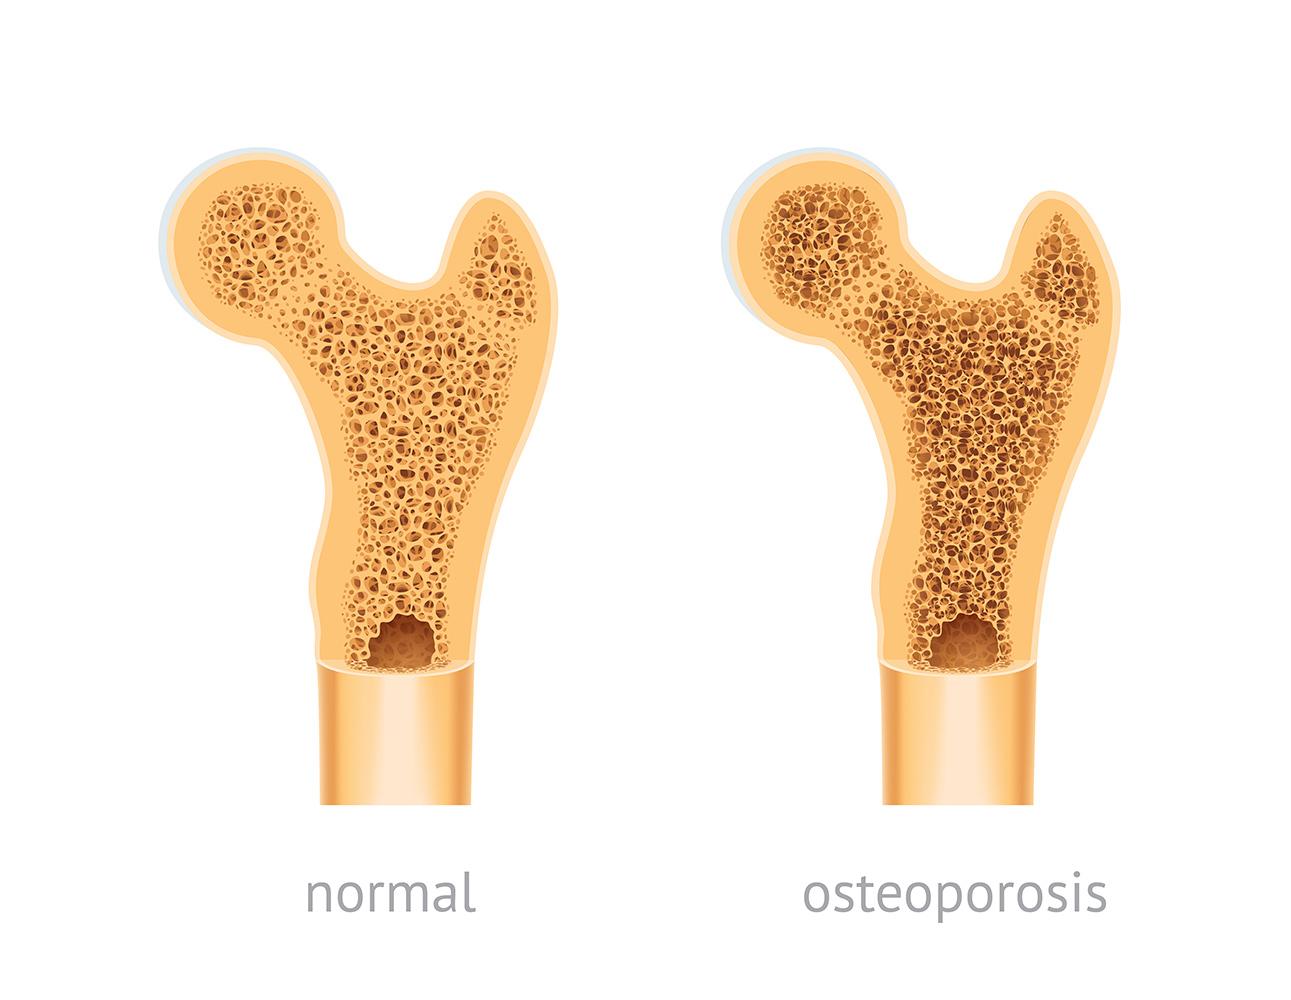 fractura osteoporosis menopausia